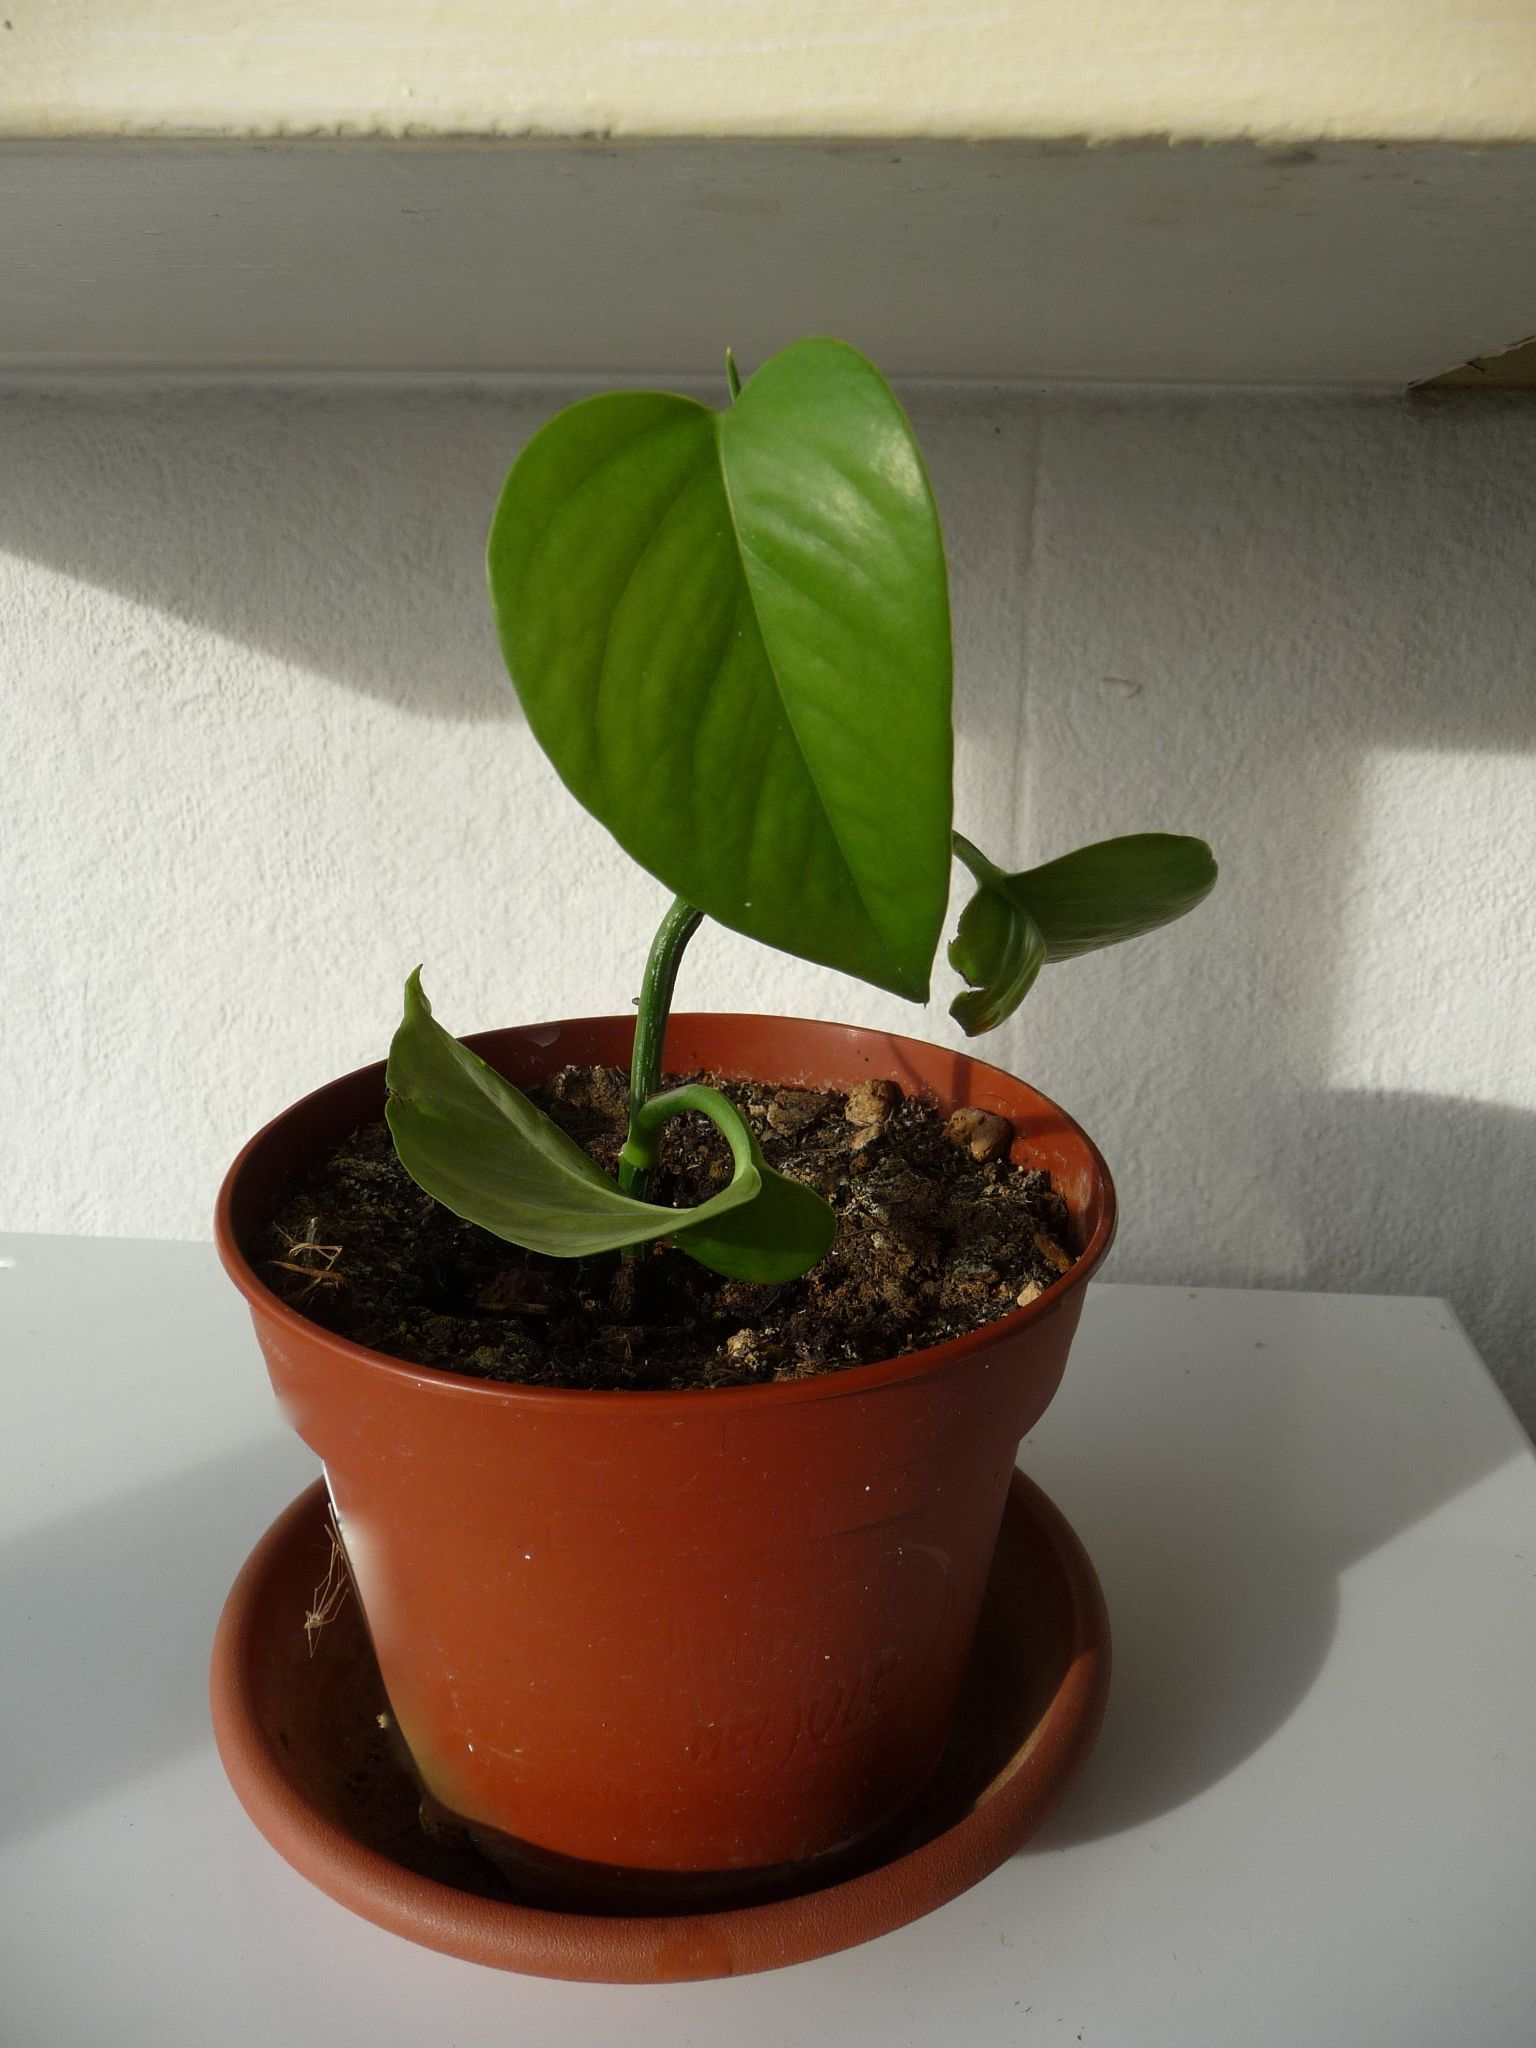 Comment r aliser une bouture de plante d polluante le for Plante truffaut